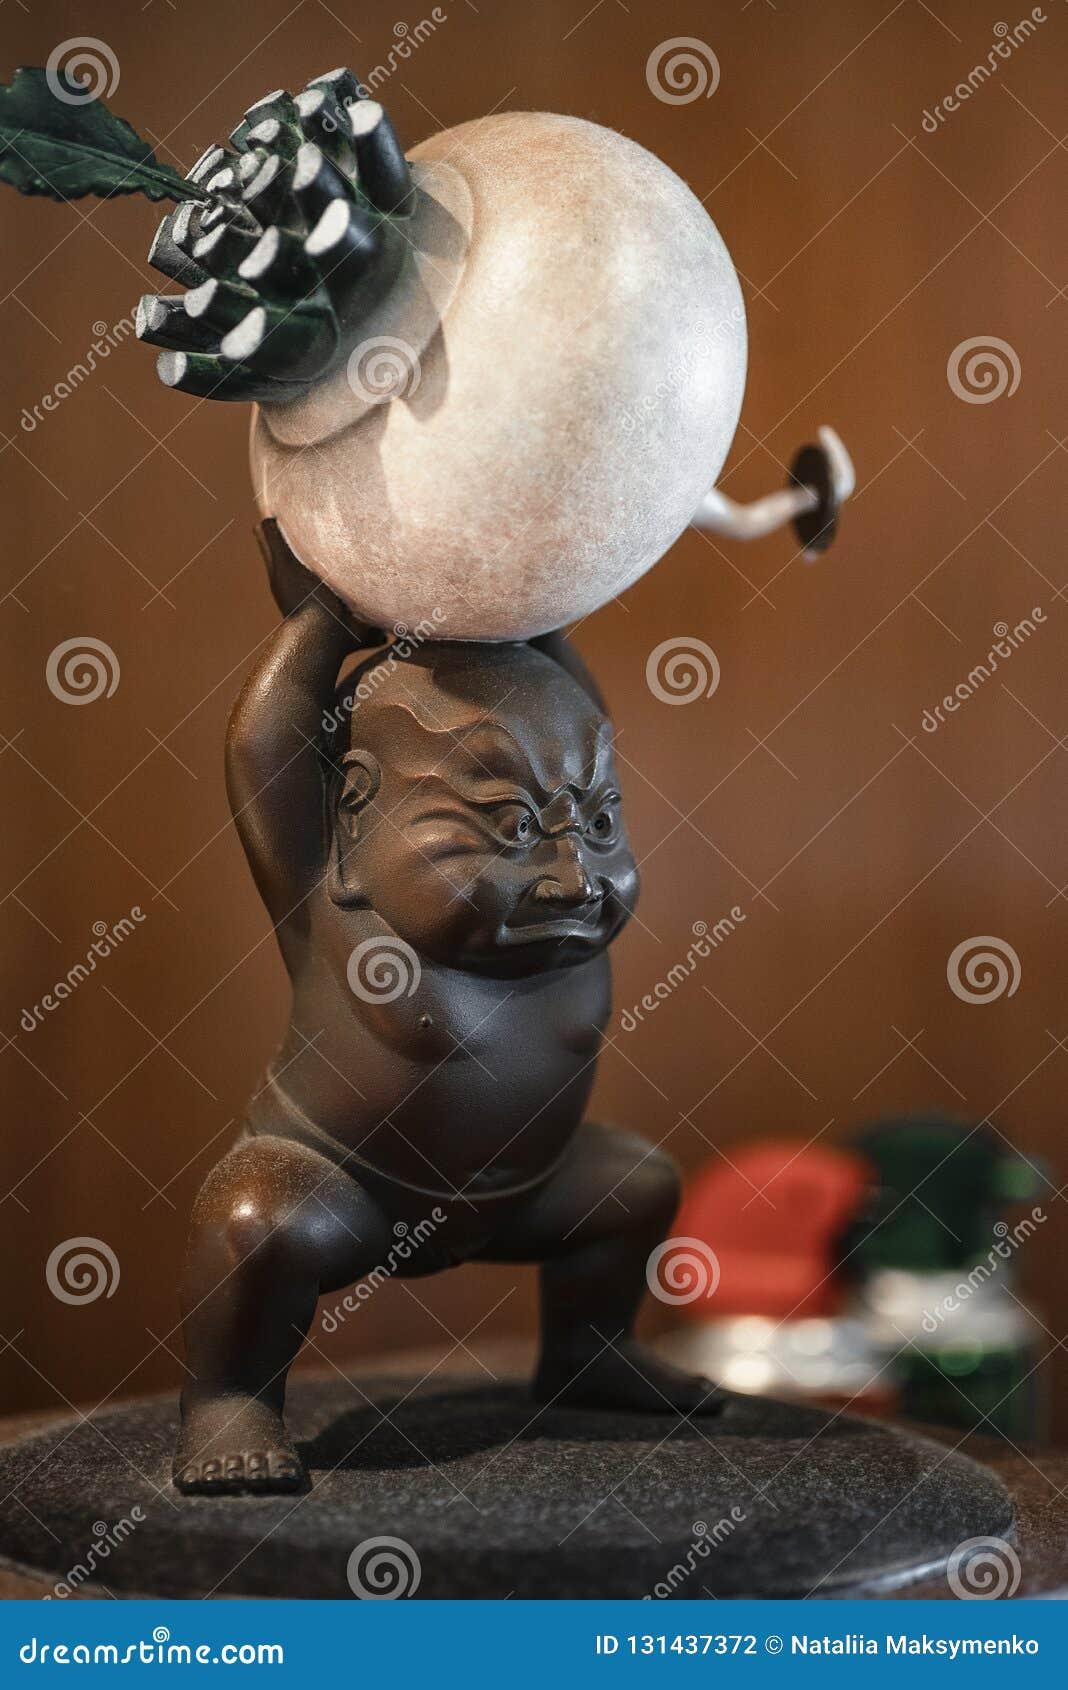 Japanese ceramic statuette symbol. Japanese ceramic figurine of a man with a radish.The figurine souvenir.background